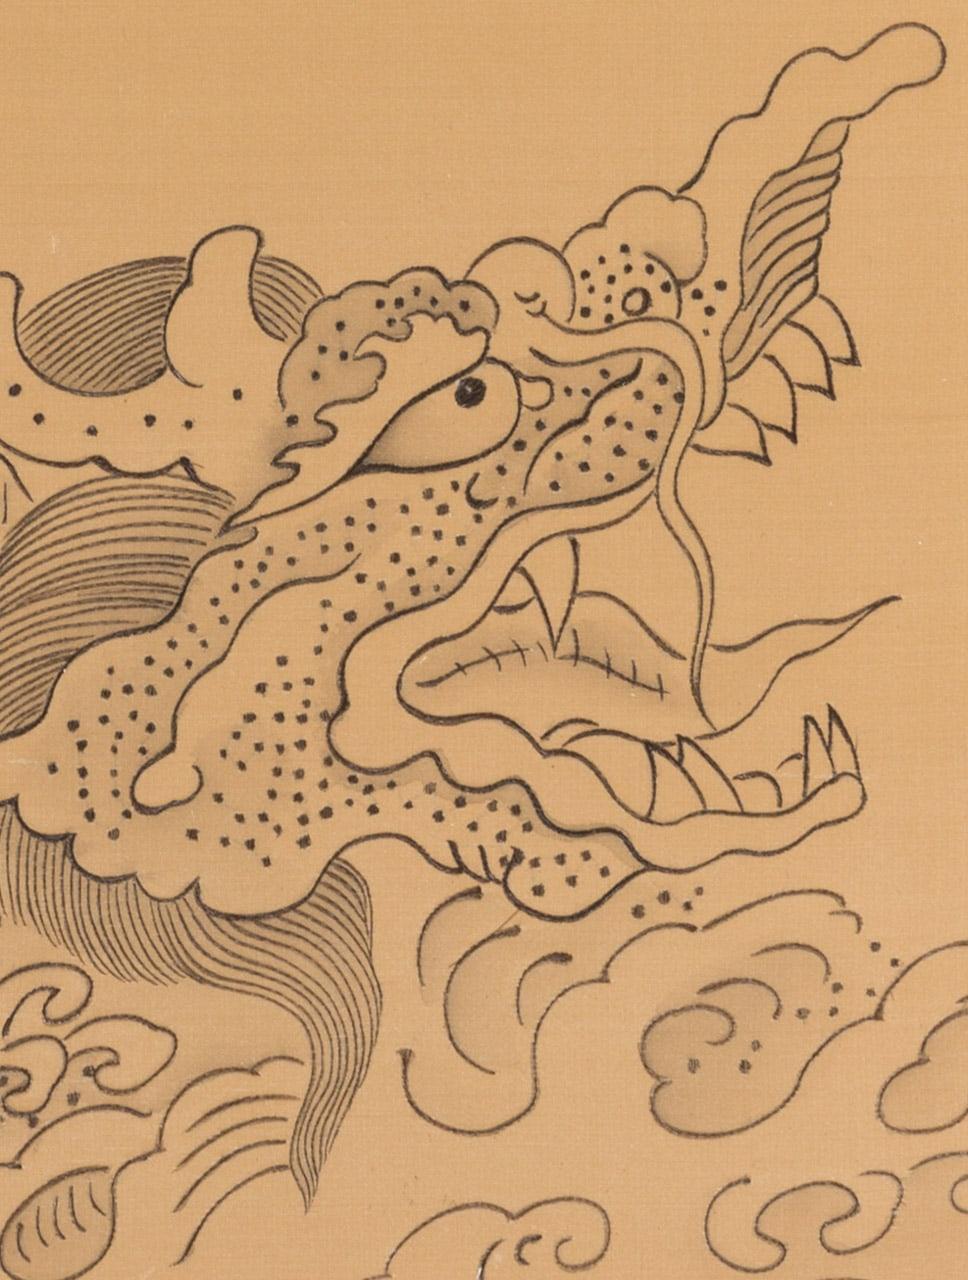 Riding the Dragon (detail)